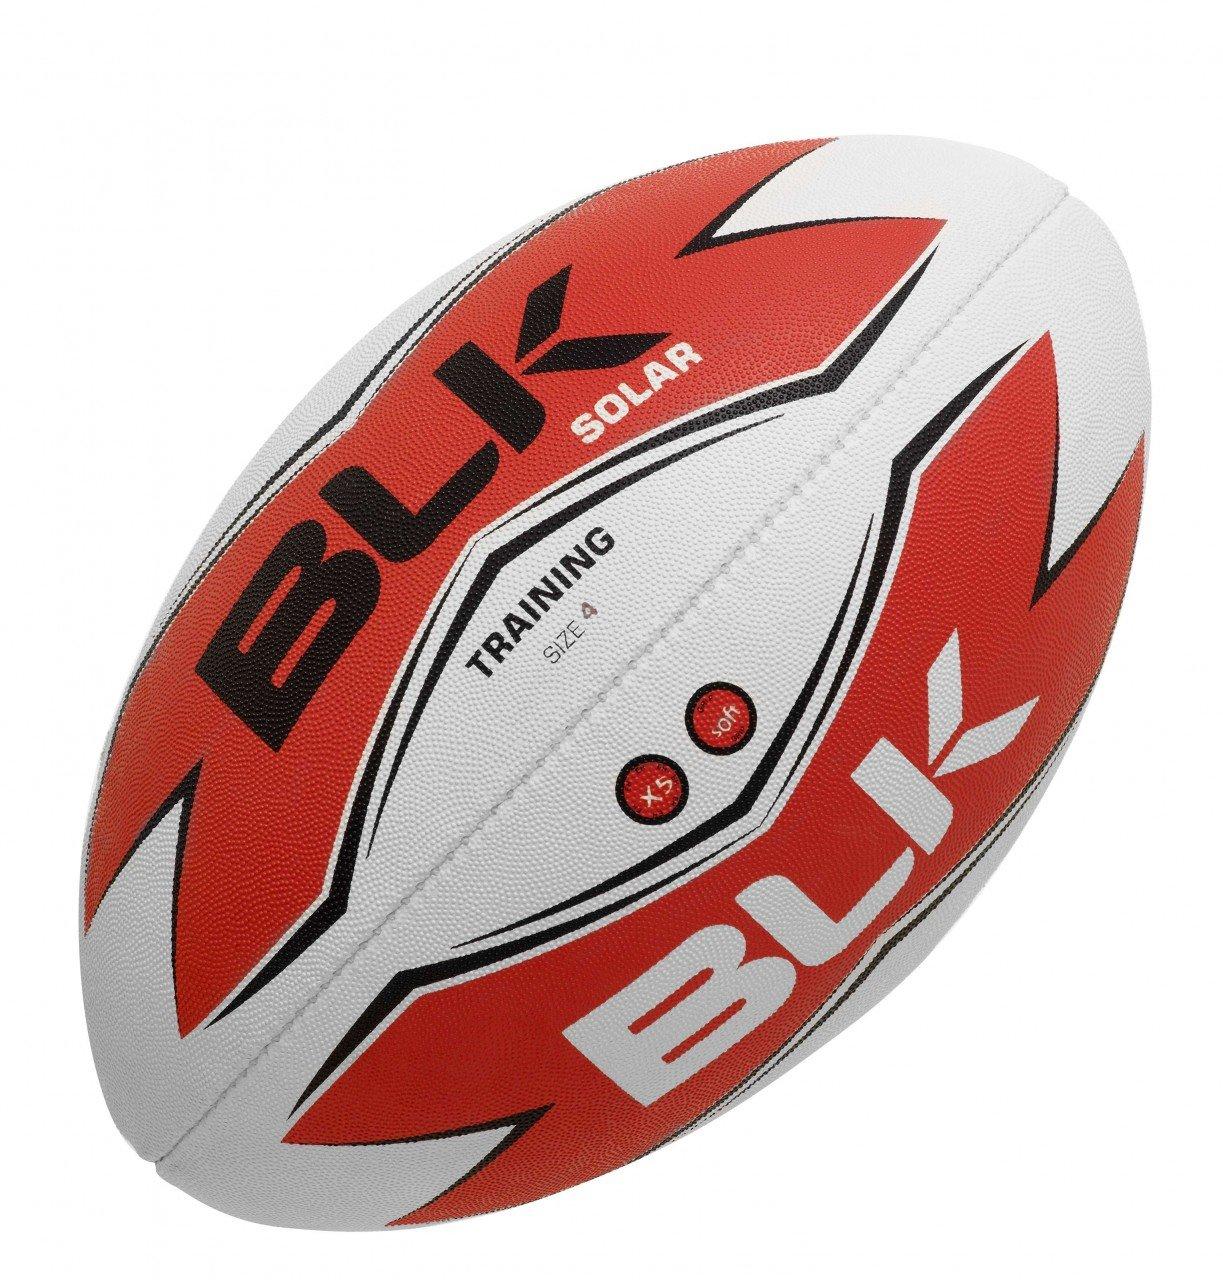 BLK Solar Ballon de Rugby Mixte UHLAA|#uhlsport